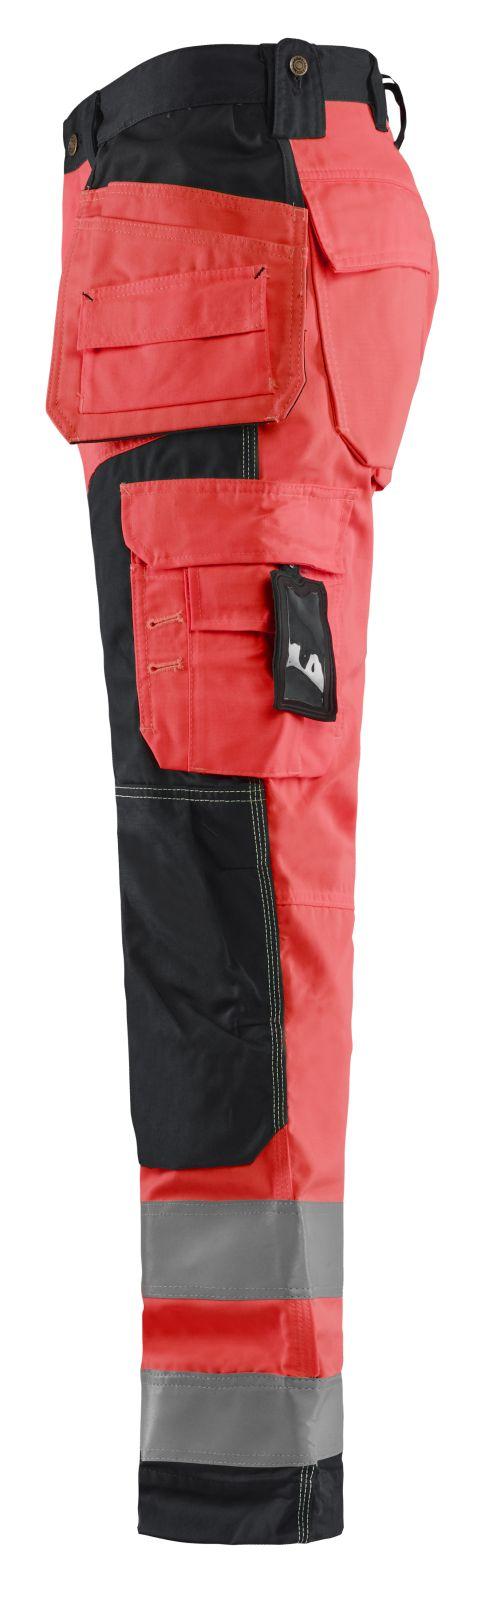 Blaklader Werkbroeken 15681811 High Vis fluor rood-zwart(5599)